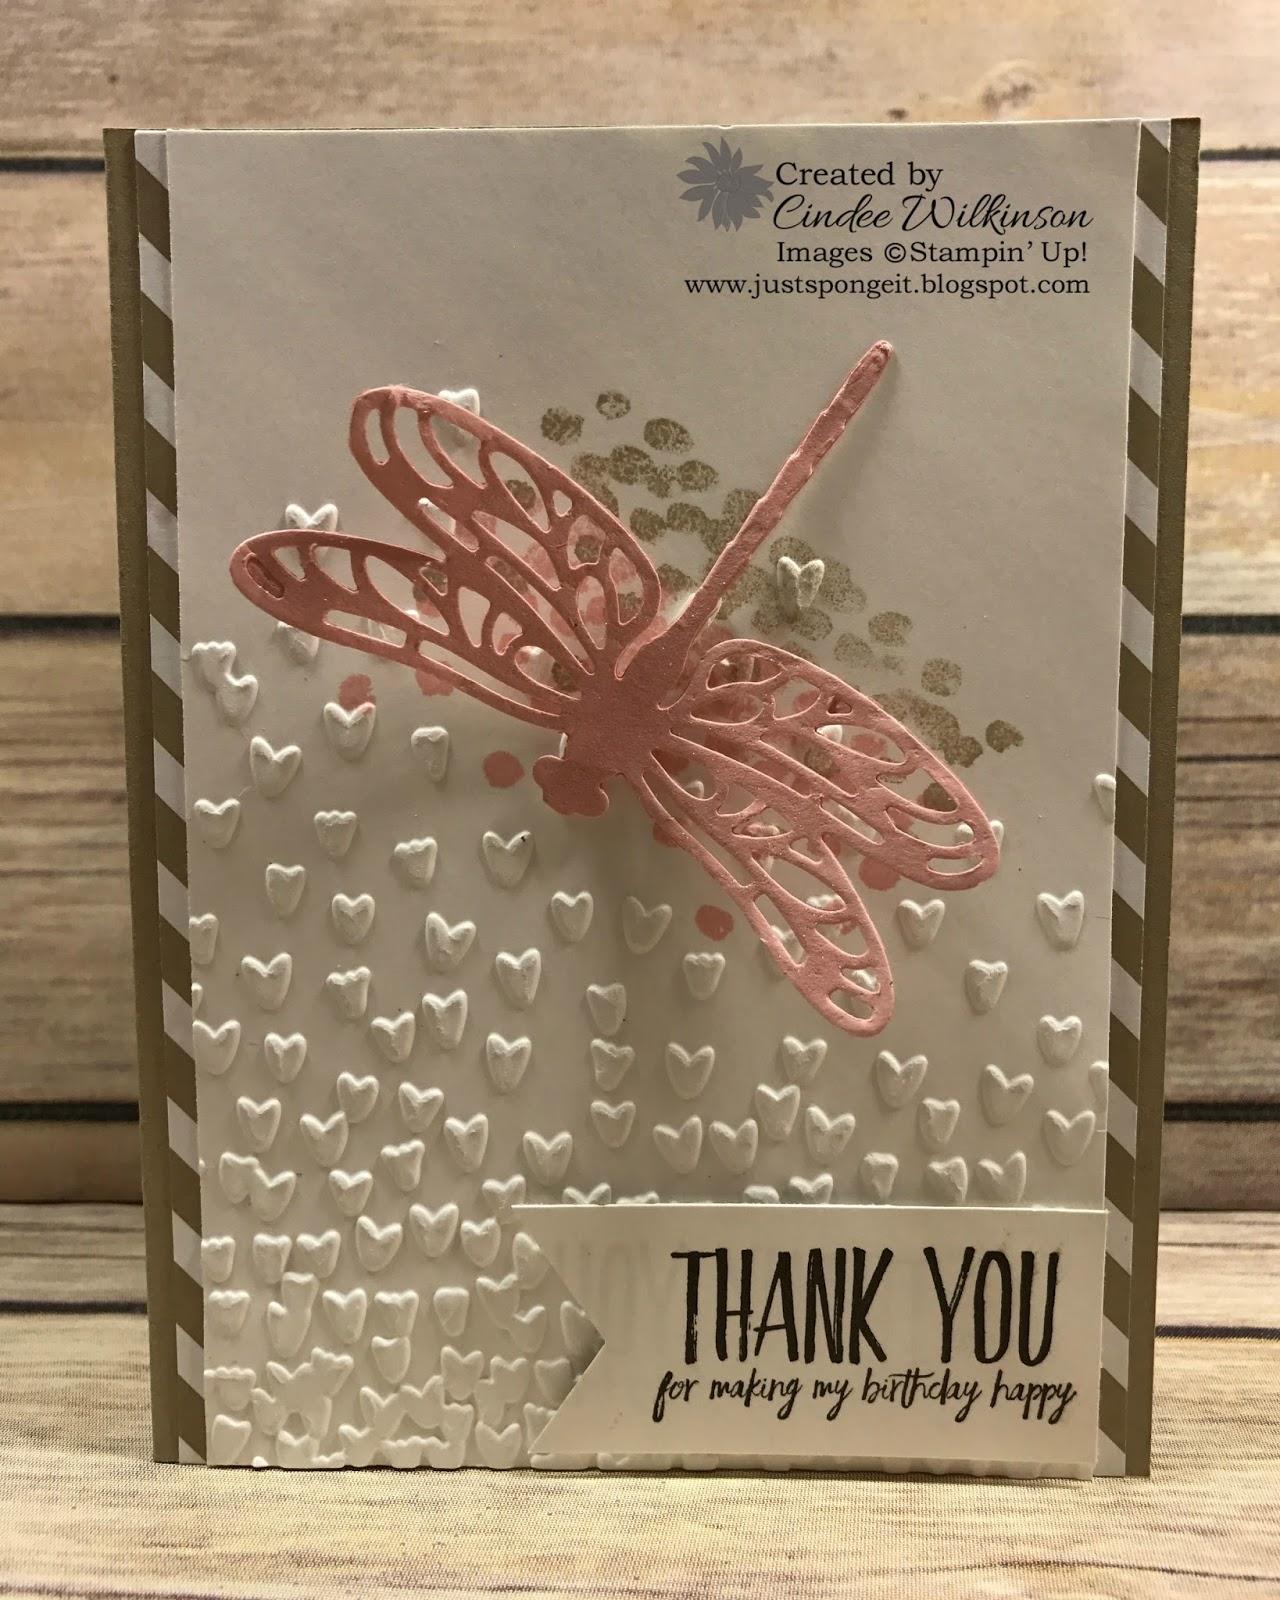 Dragonfly Dreams Bundle Thank you Cards – Just Sponge It!